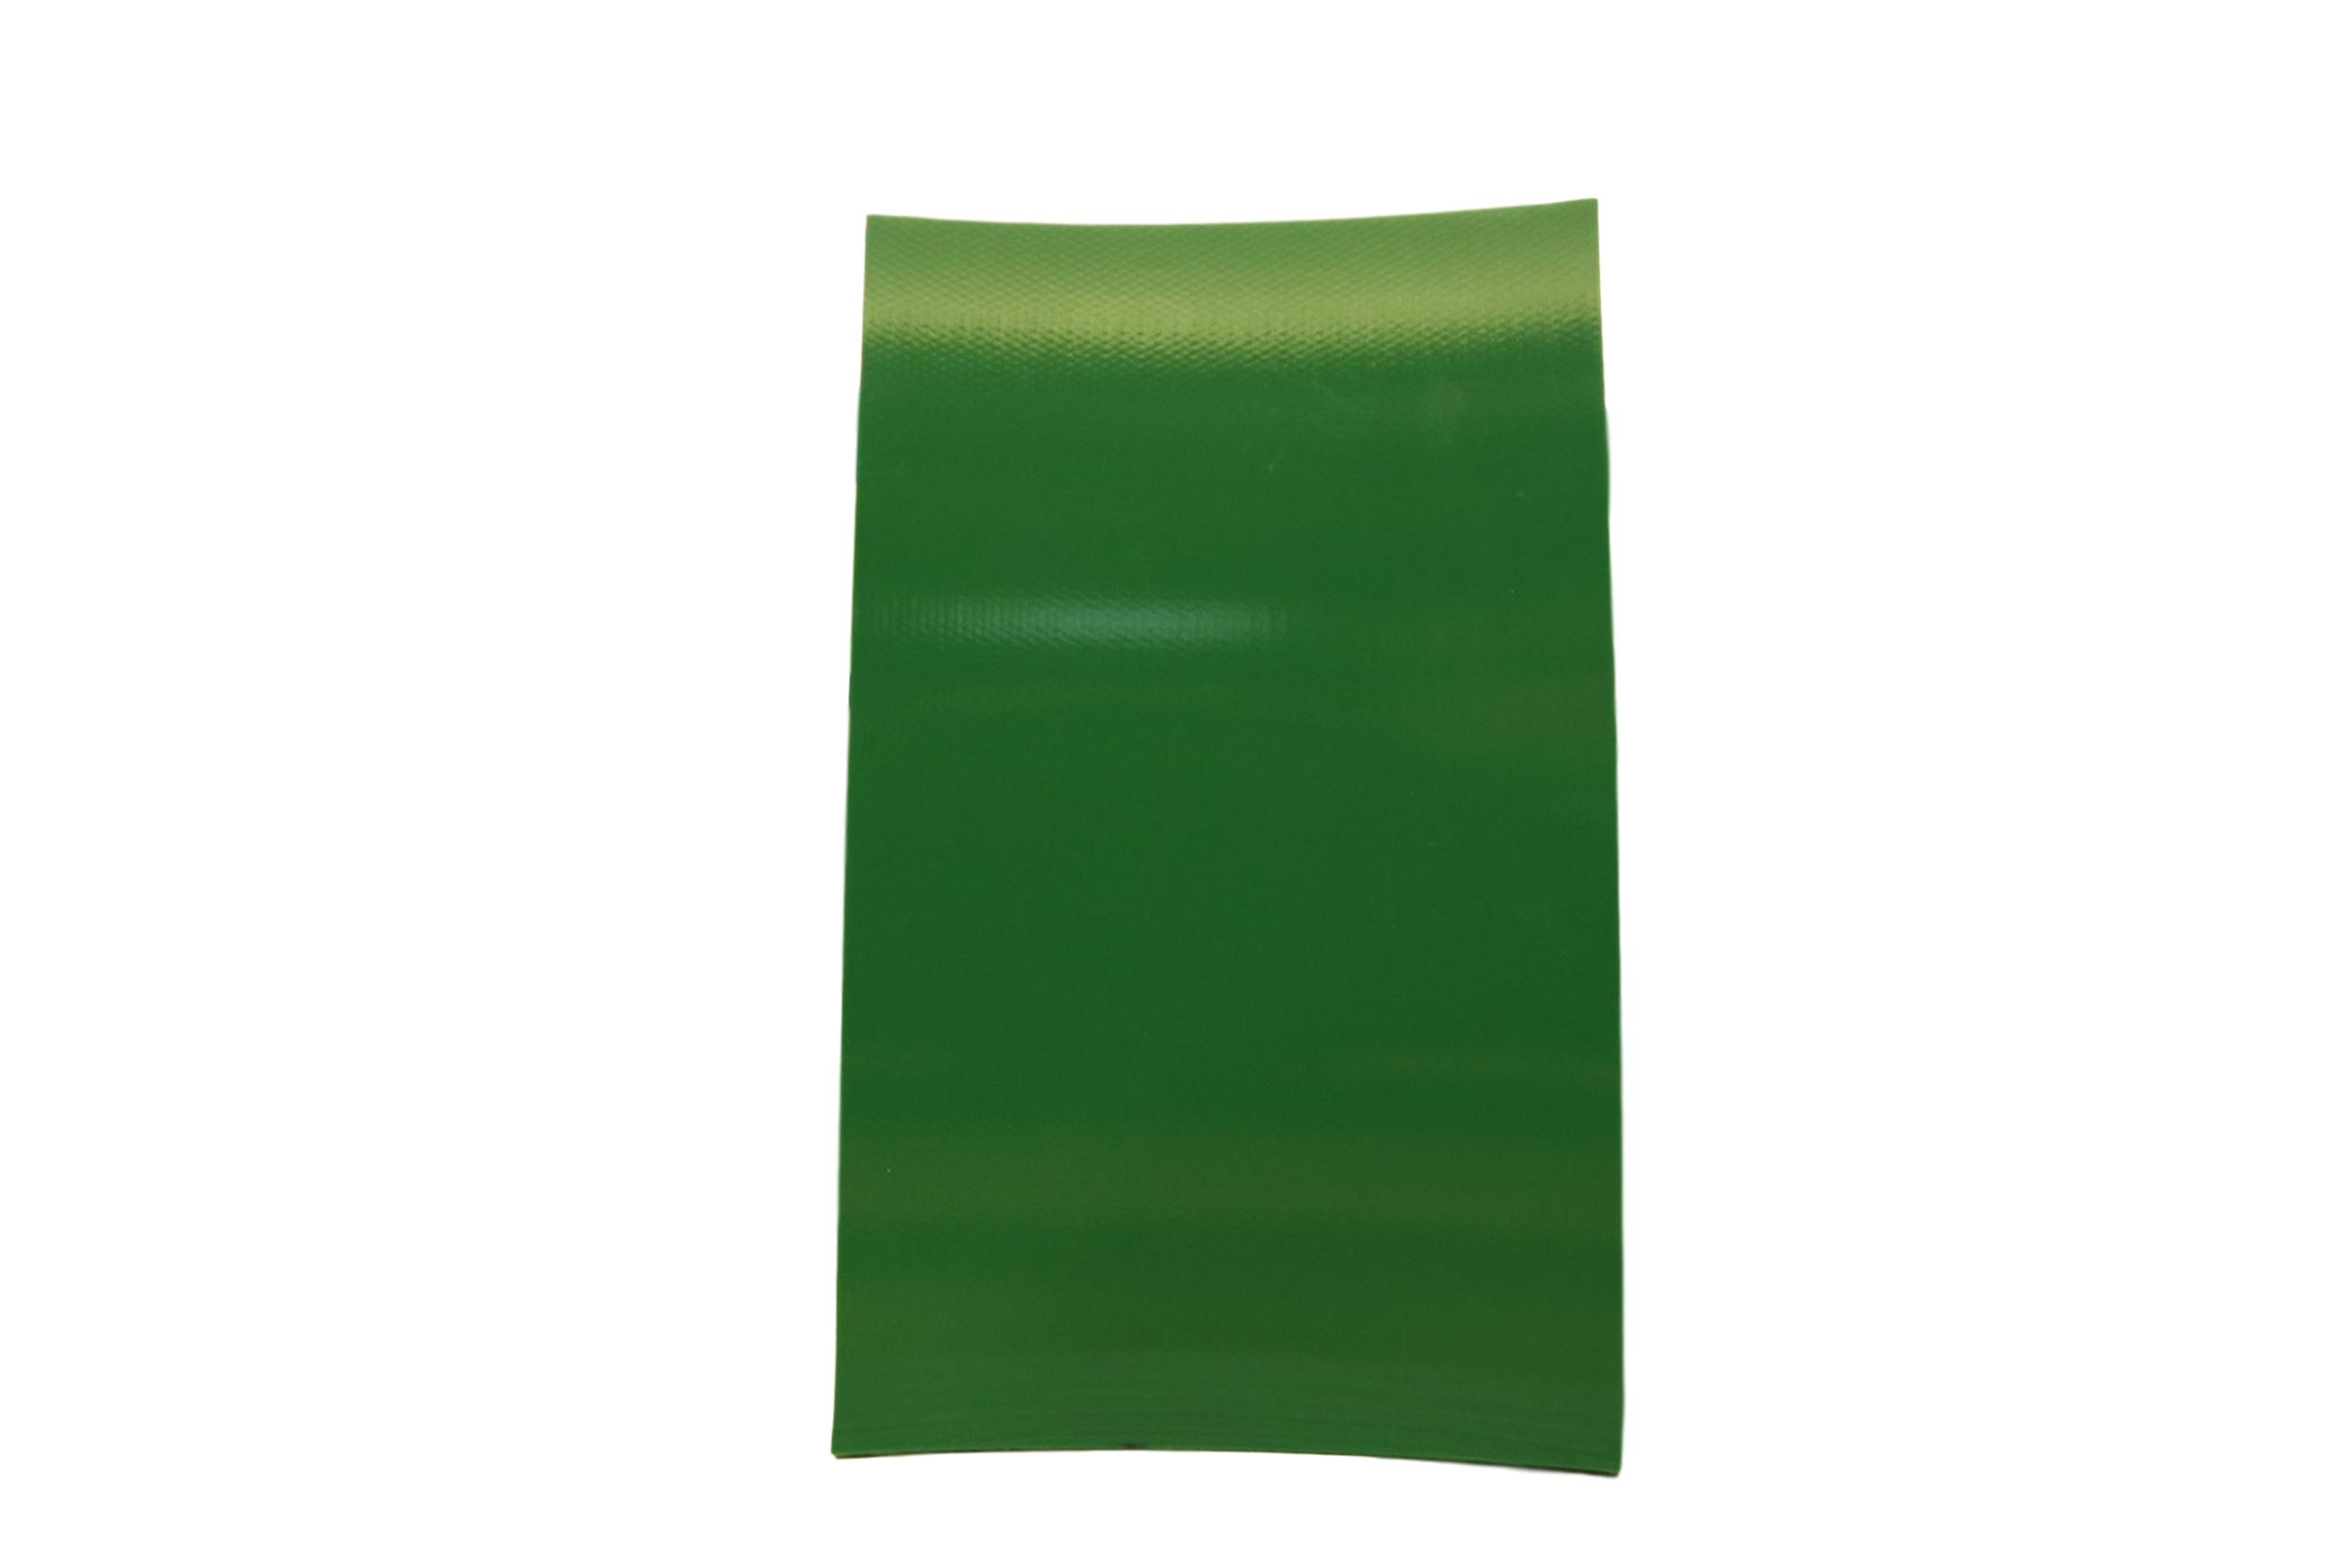 Conveyor Belting Green PVC 2 PLY Fabric Back 2.5mm